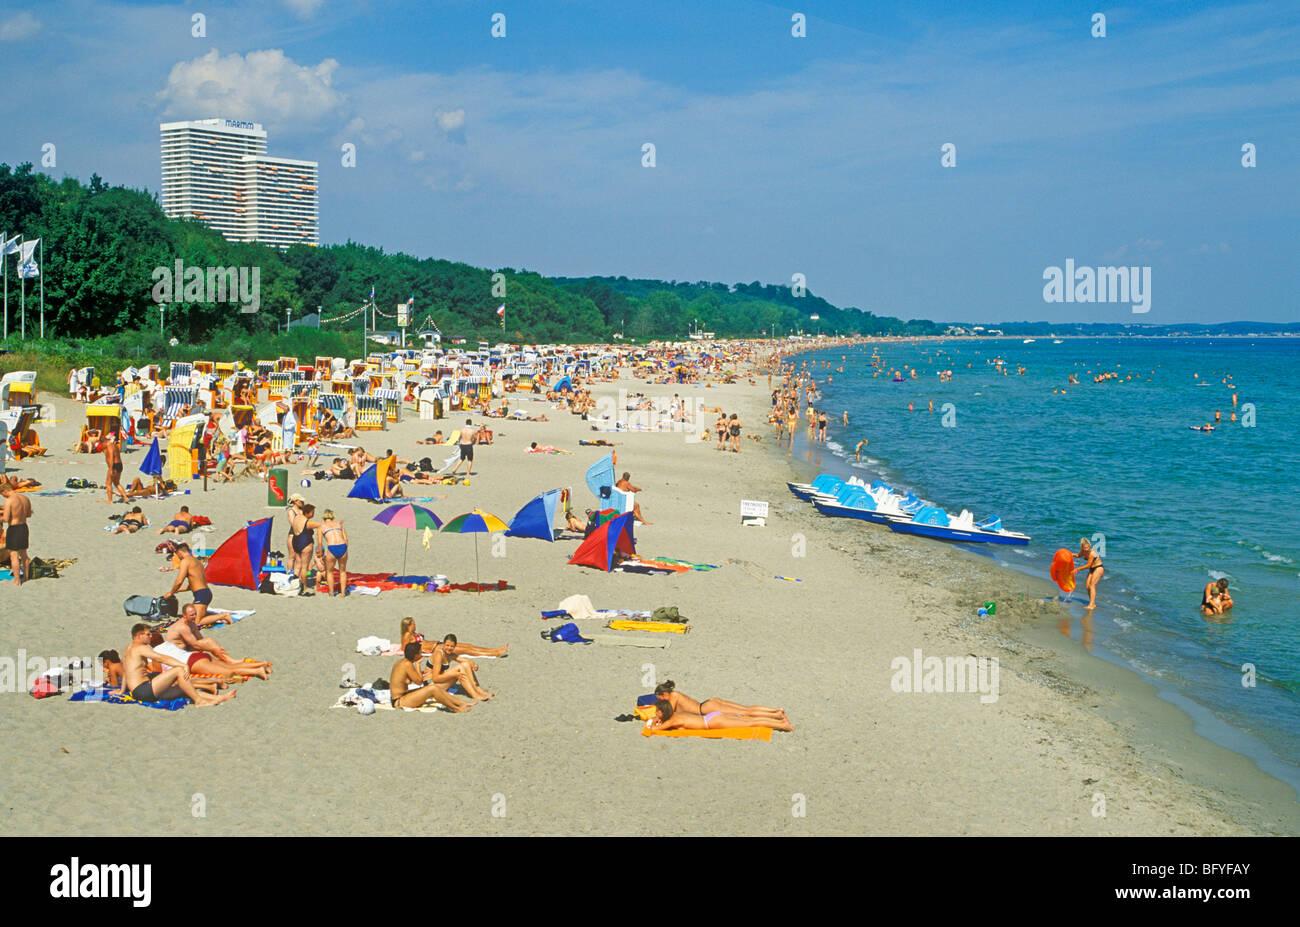 Seaside Resort Timmendorfer Strand Baltic Sea Coast Stock